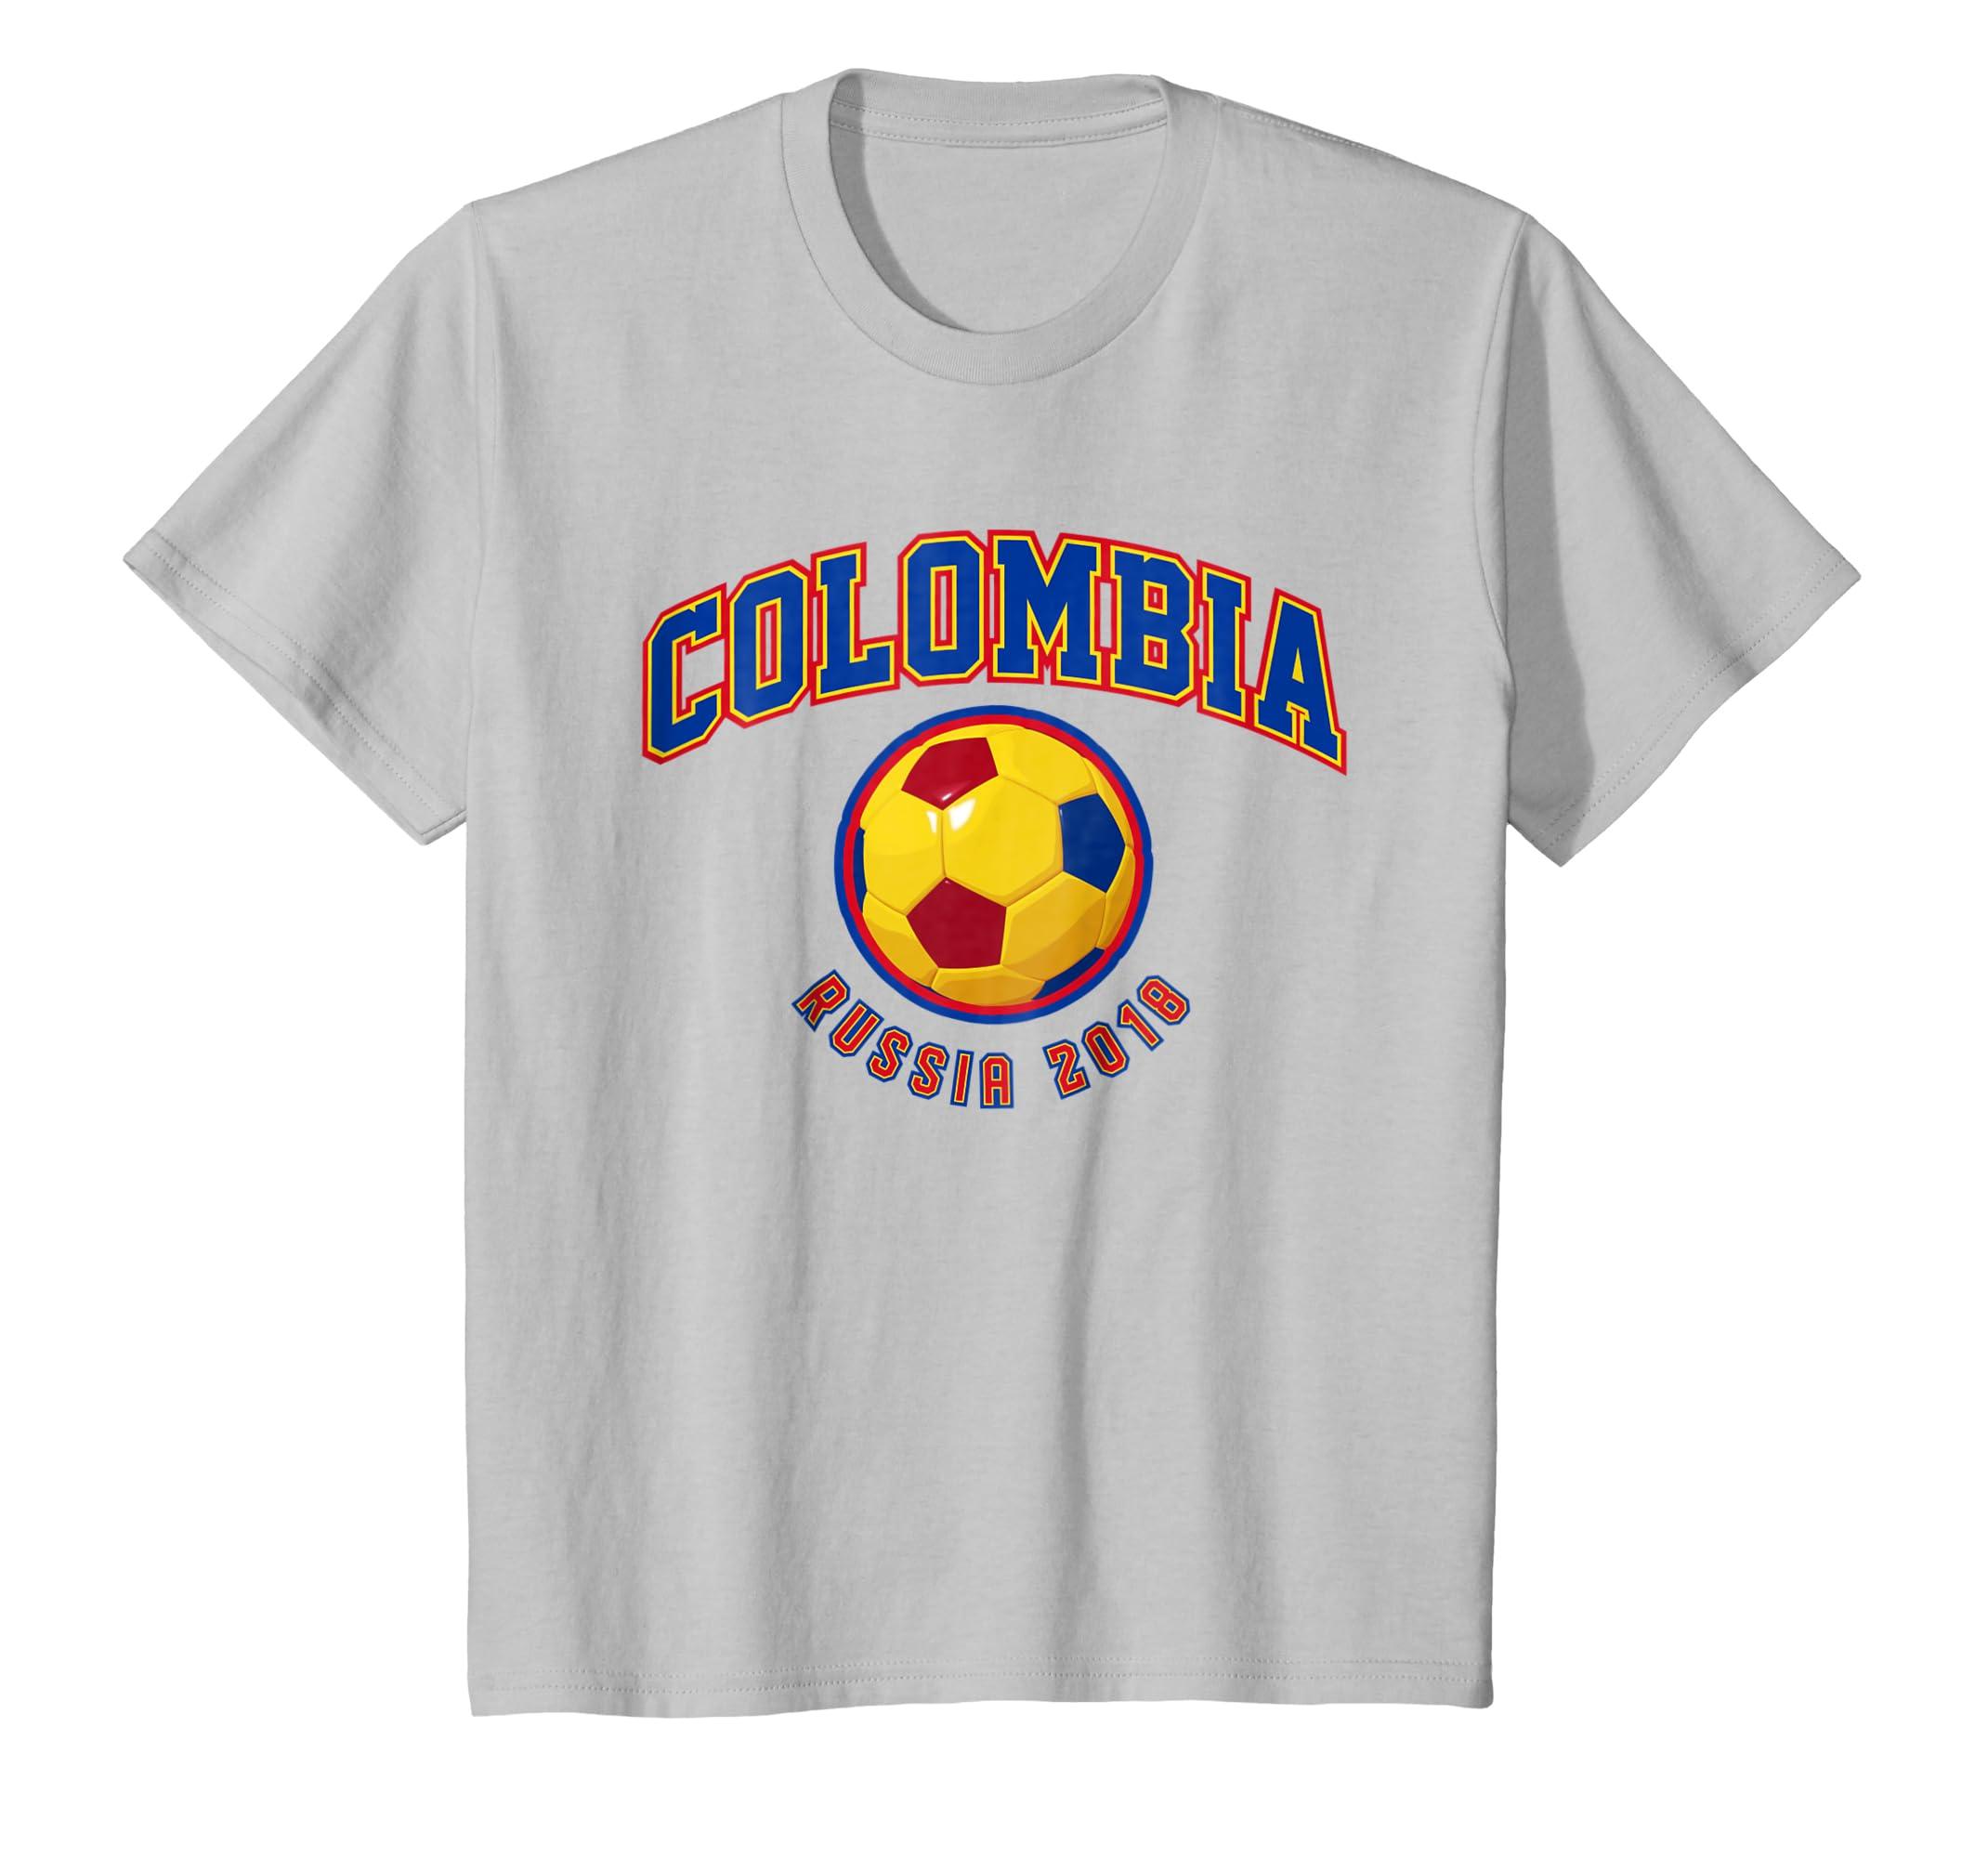 Amazon.com: Colombia Soccer Shirt 2018 Russia World Futbol Team Cup: Clothing